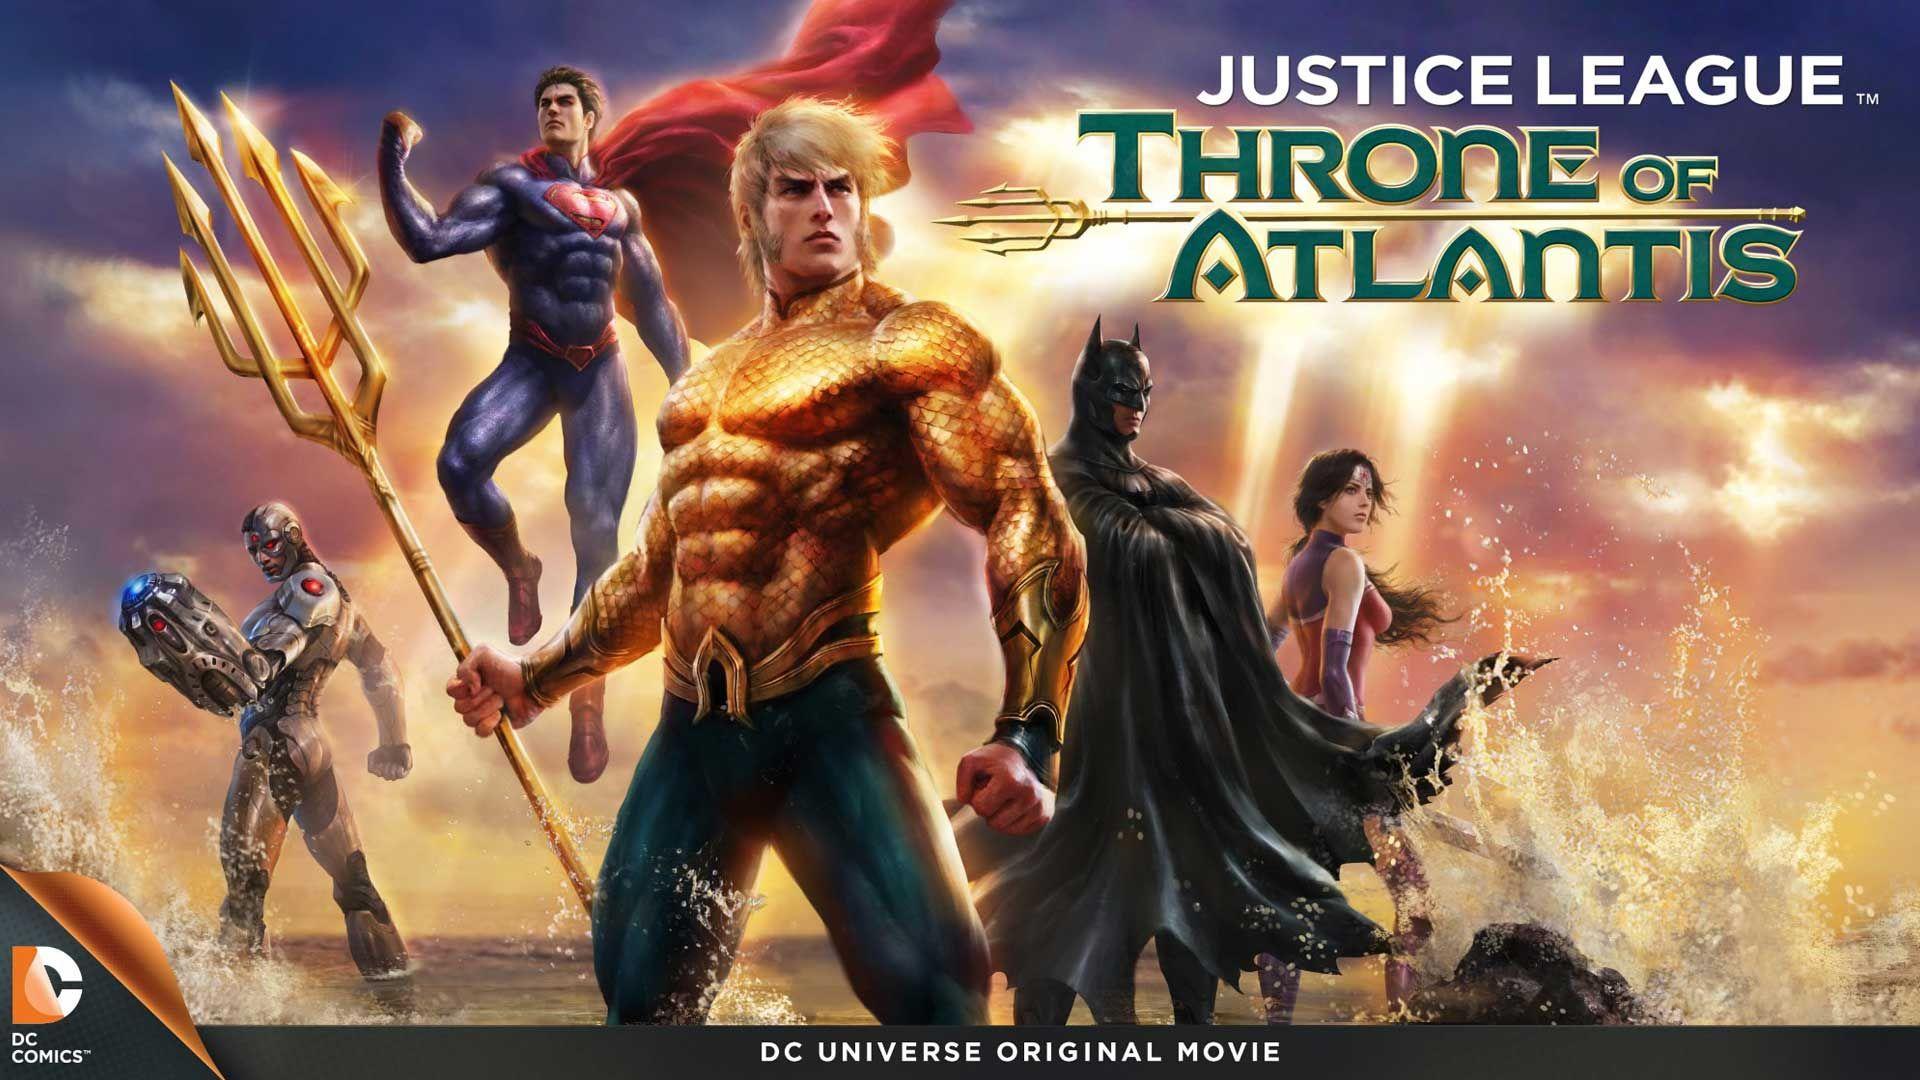 Justice League: Throne of Atlantis (2015) | DC Comics